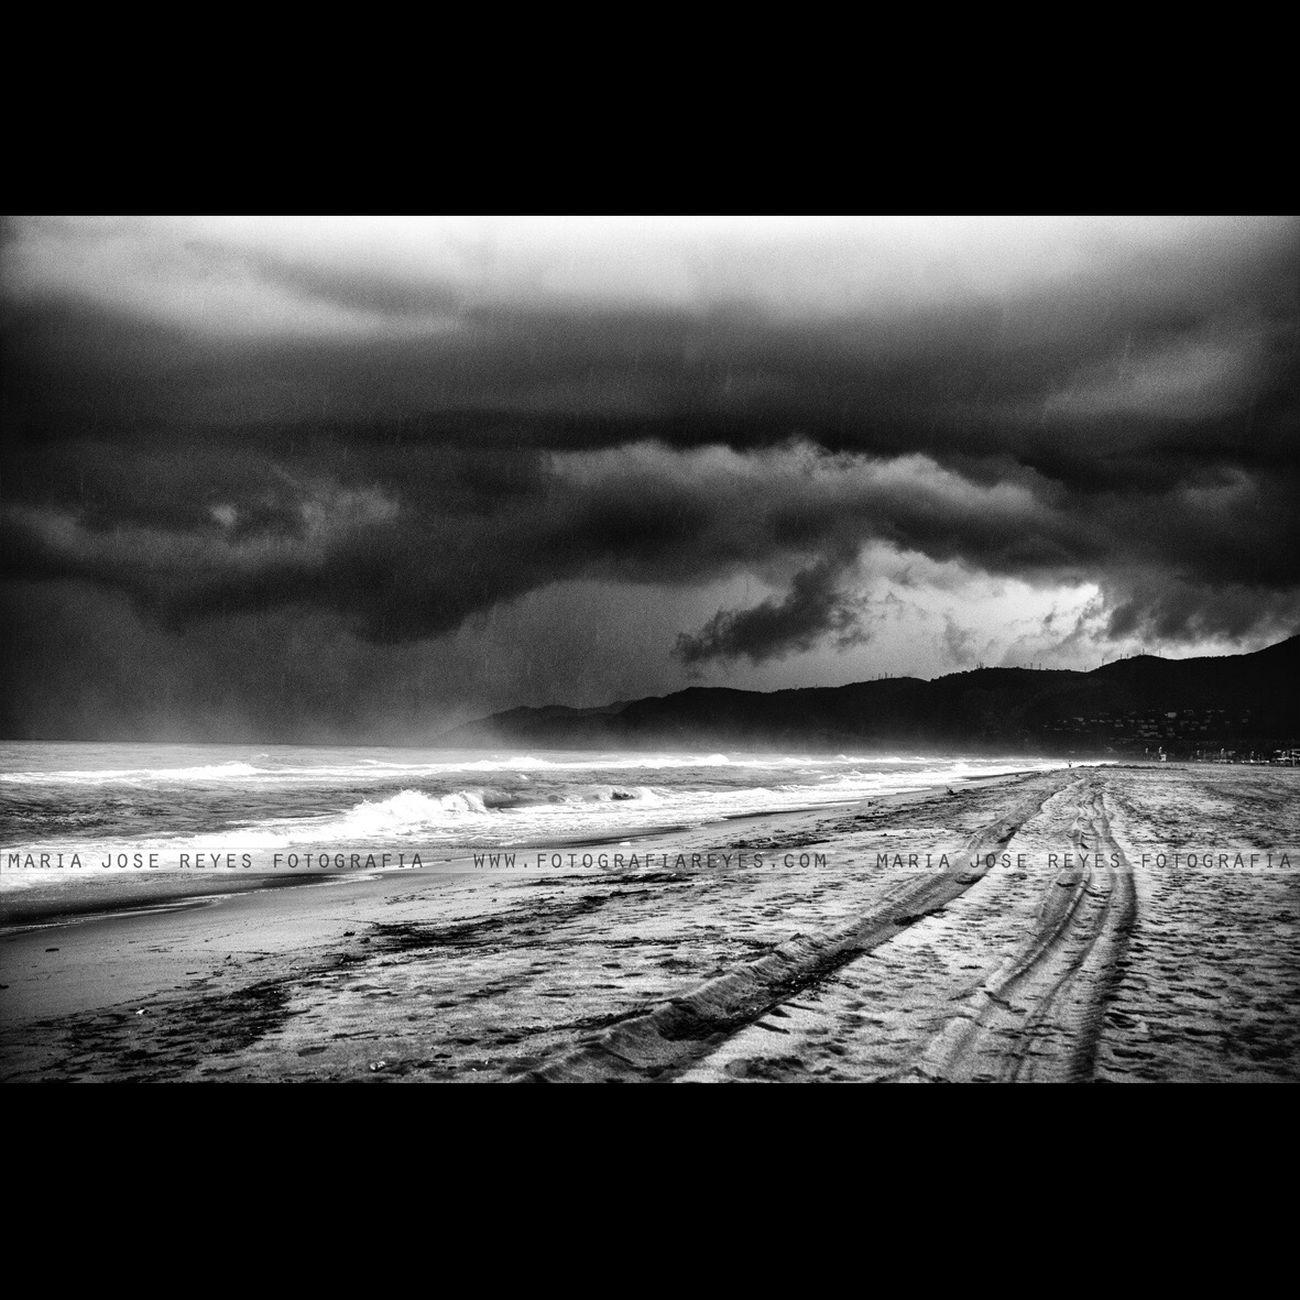 Antes de una tormenta - Castelldefels. Fotografía: María José Reyes Cloud - Sky Beach EyeEm Nature Lovers Sea EyeEm Best Shots Landscape Black & White EyeEm Nature Lover